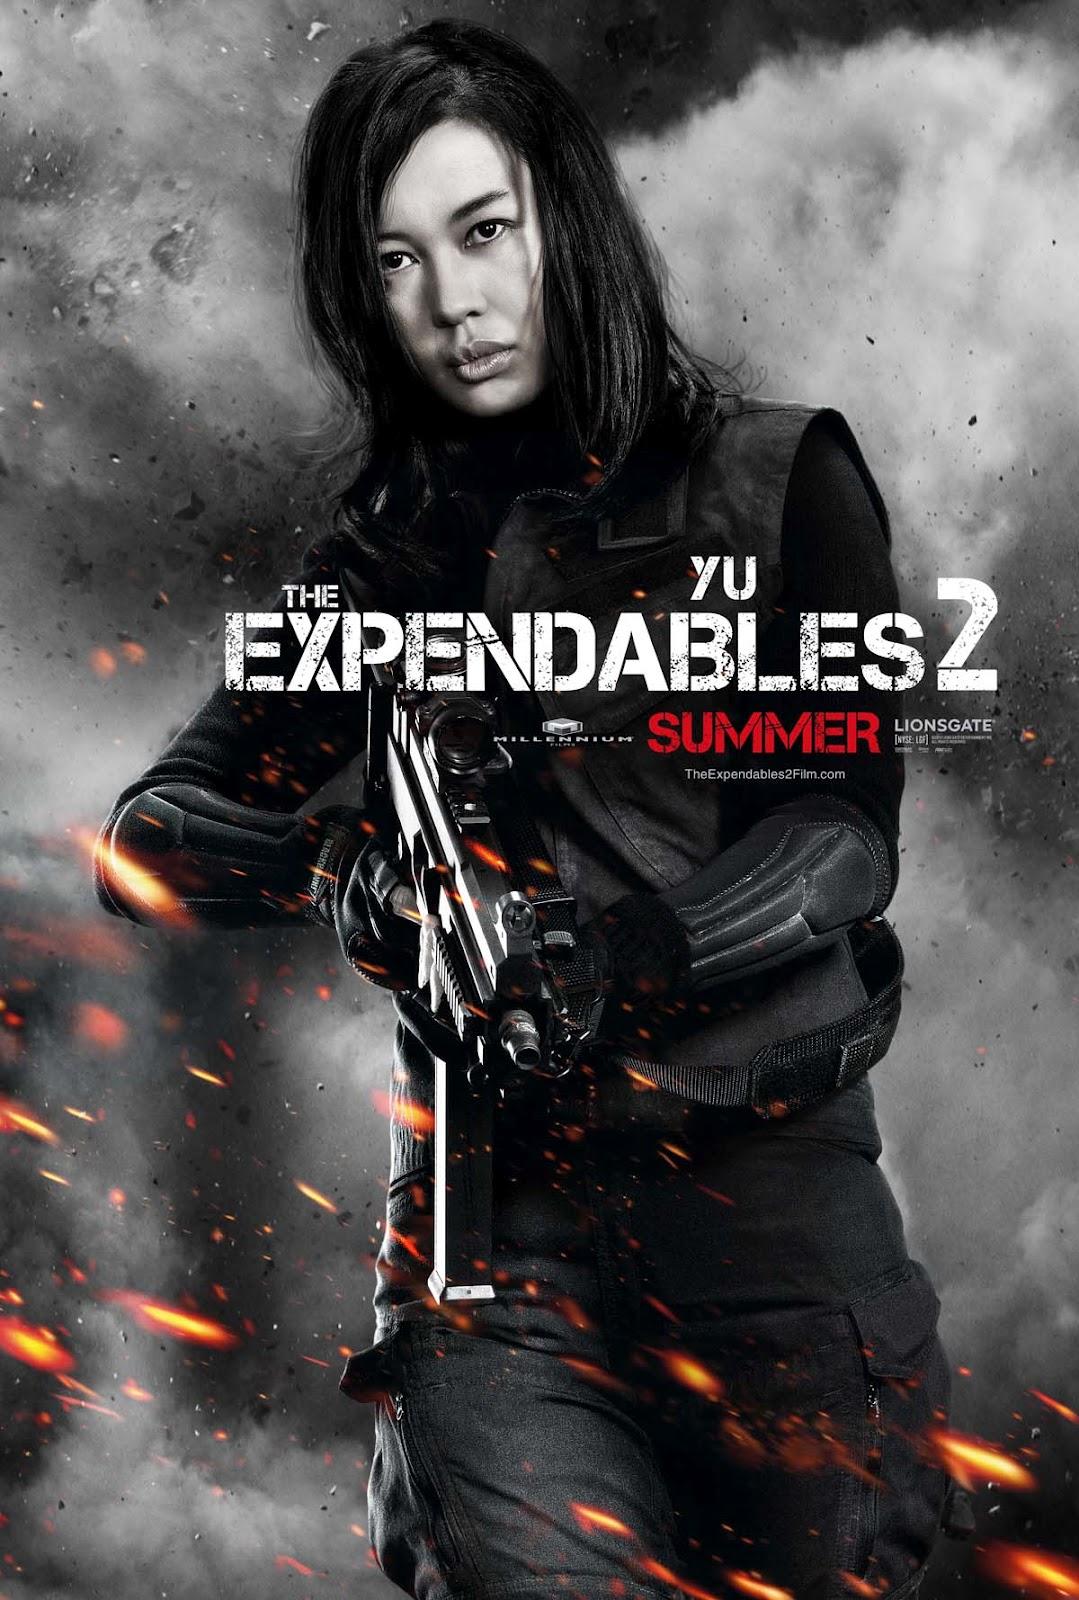 http://1.bp.blogspot.com/-_TLGh40qXw8/T51jQYlbuxI/AAAAAAAAD2Q/et2xokc_Dtw/s1600/expendables-2-movie-poster-yu-nan.jpg